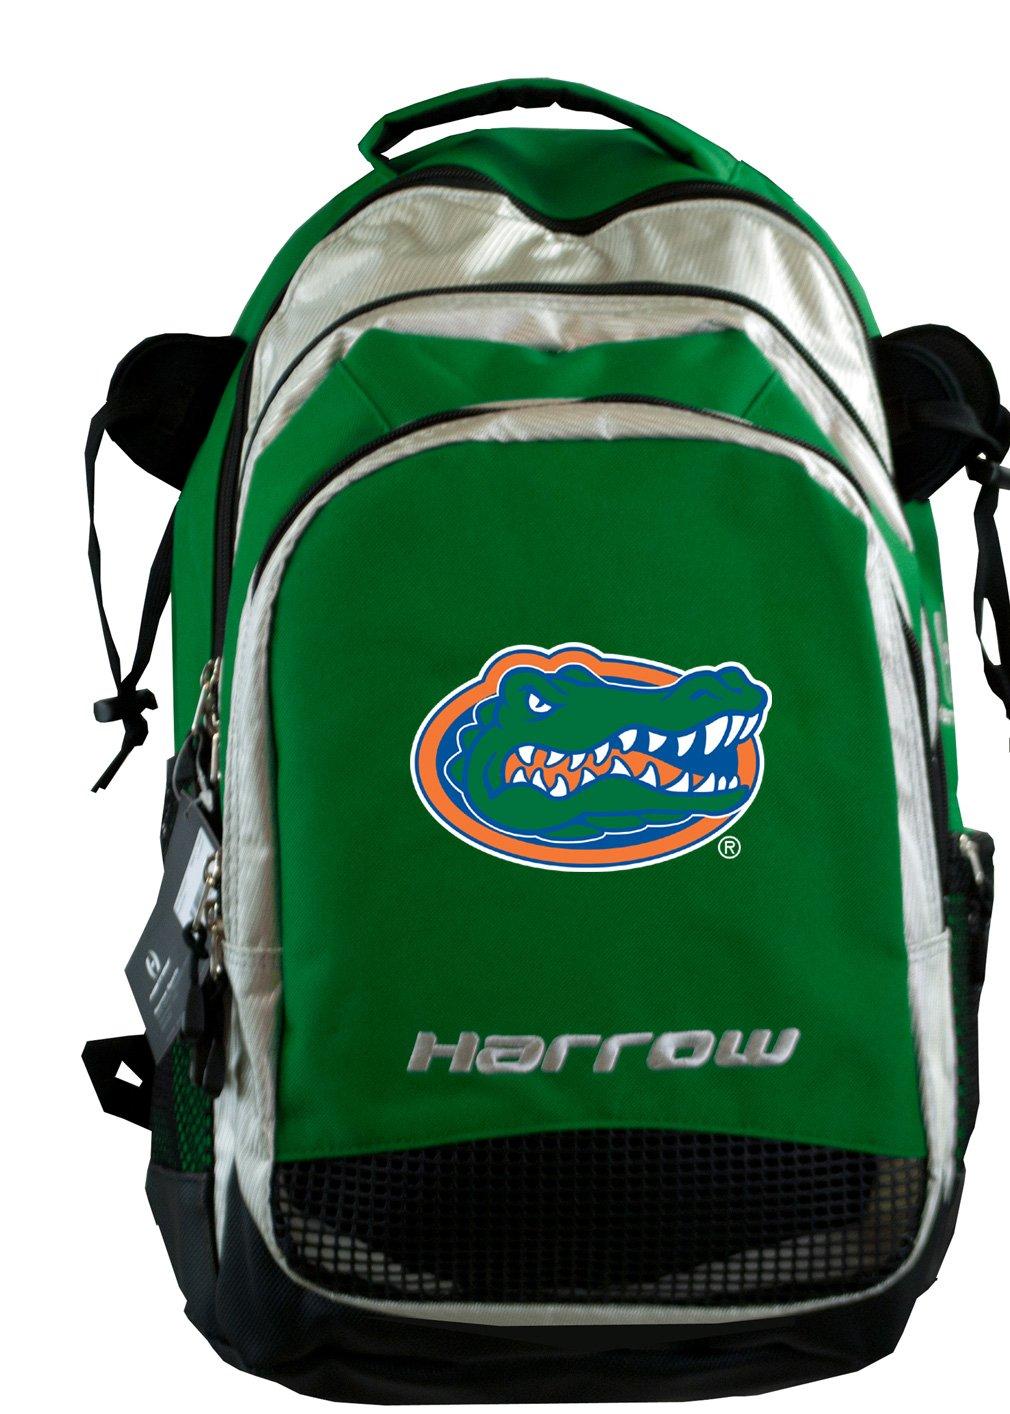 Broad Bay University of Florida Field Hockey Bag Or Florida Gators LAX Bag HARROW Green